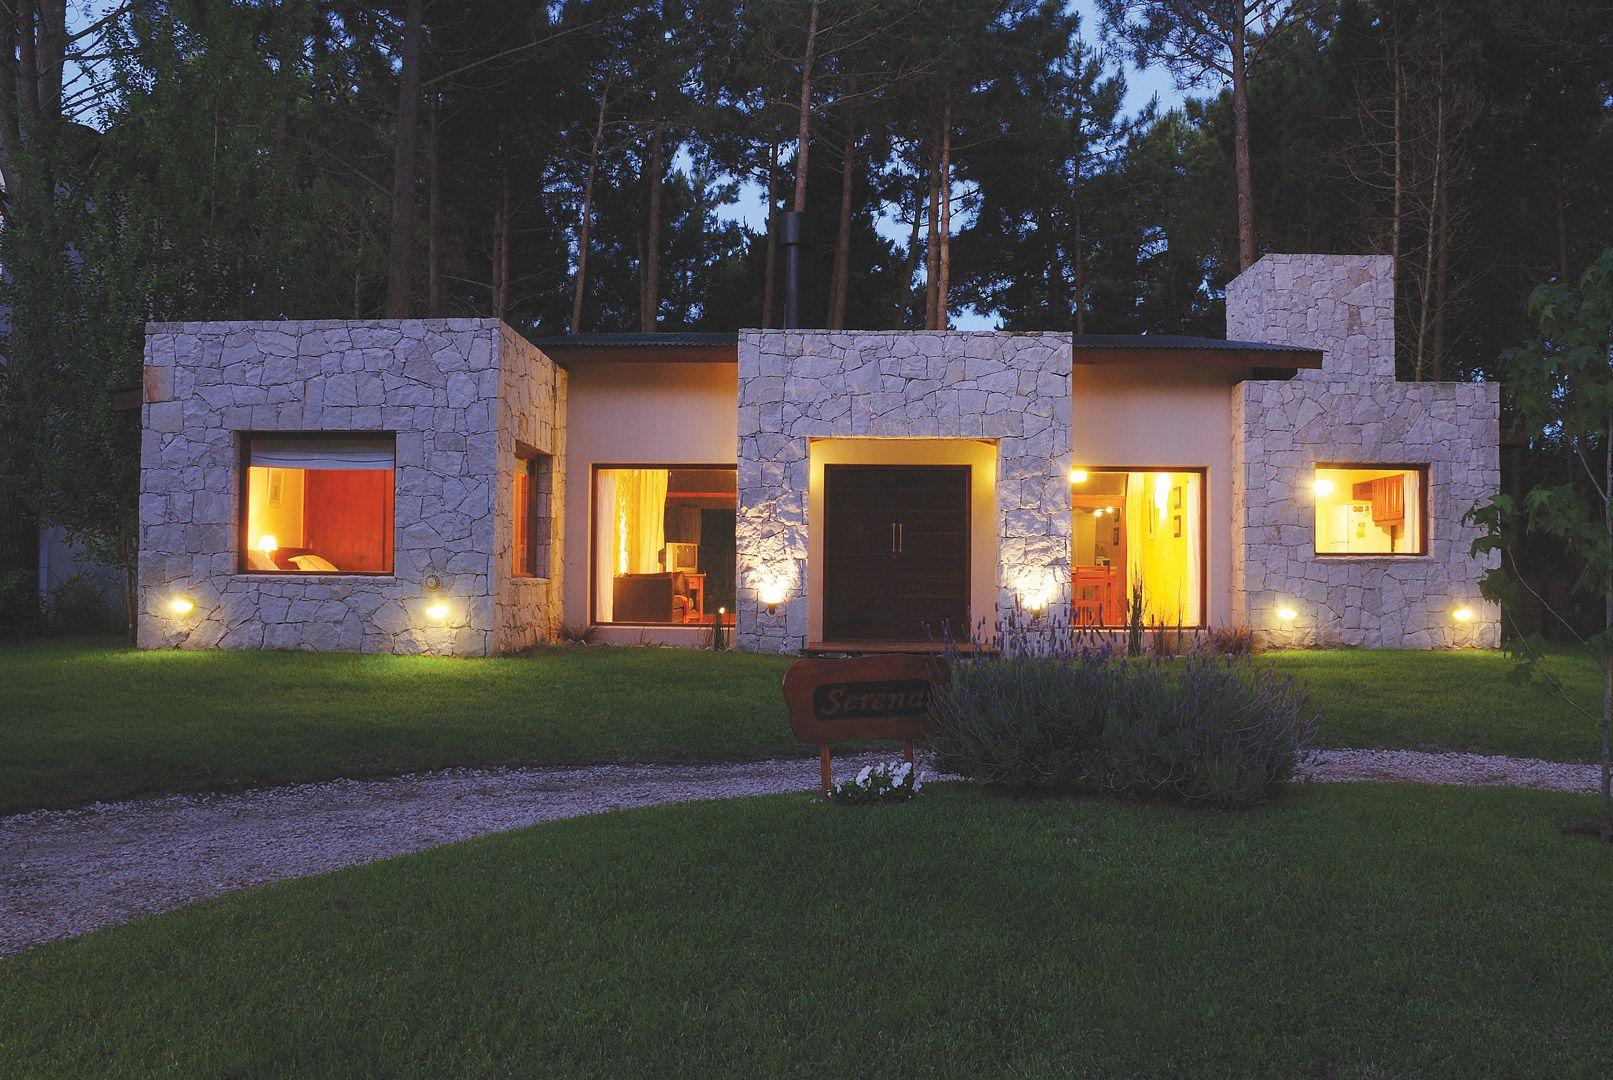 Arquitecto hugo zawadzki habitational architecture for Portal de arquitectos casa de campo